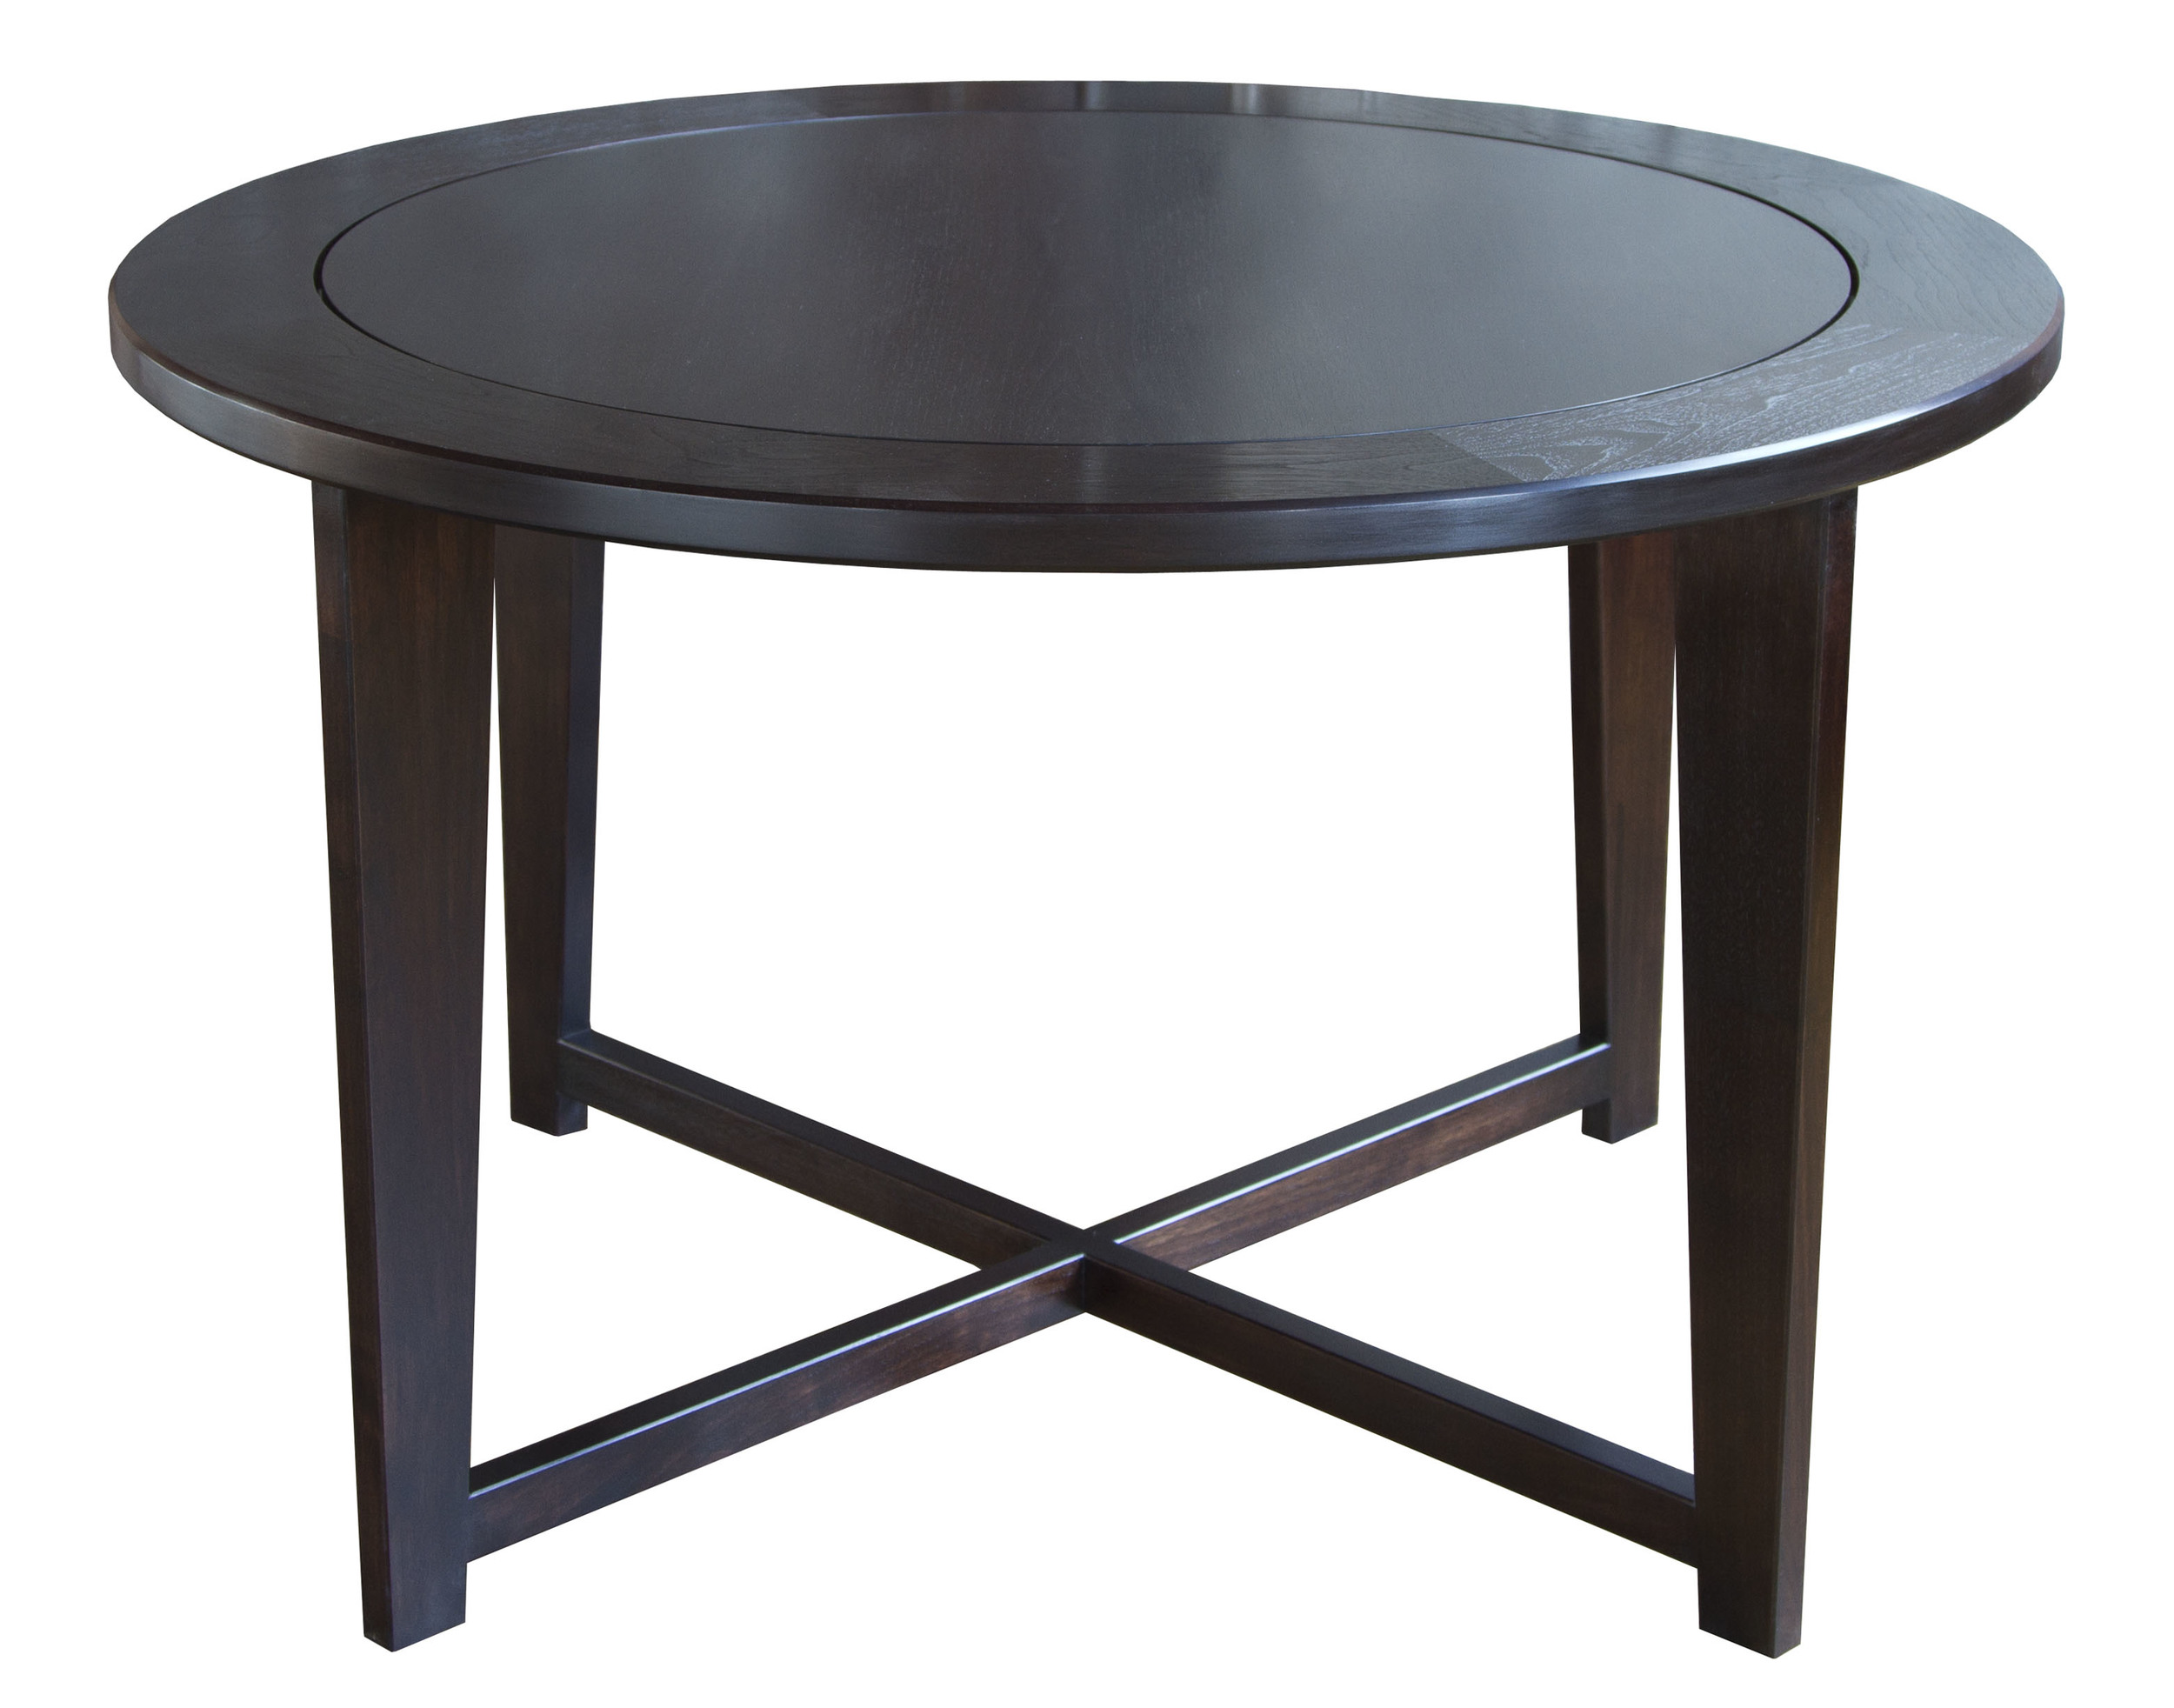 Hendricks Table in walnut - maccassar stain